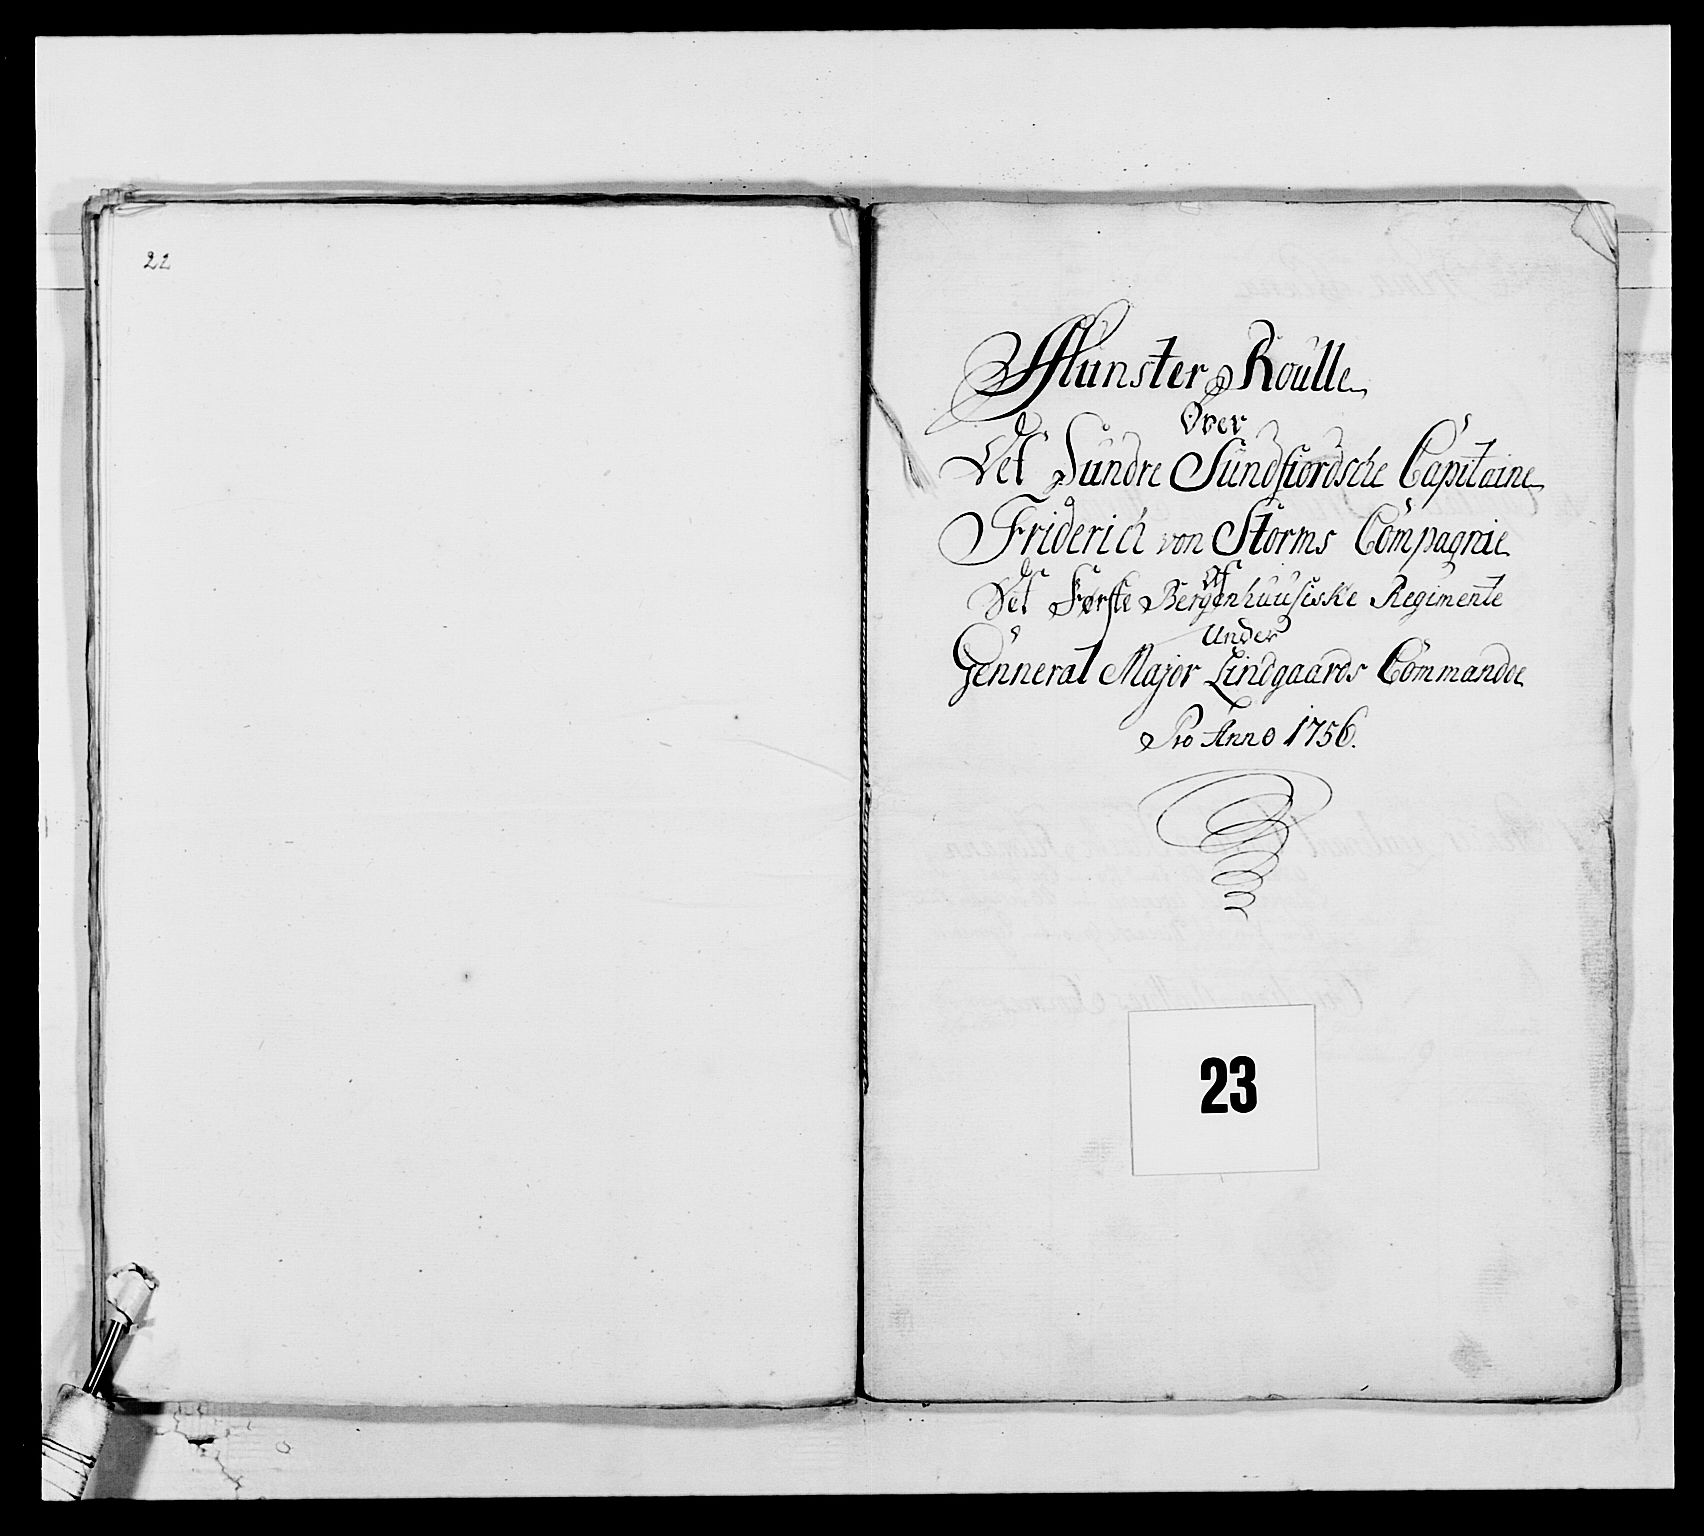 RA, Kommanderende general (KG I) med Det norske krigsdirektorium, E/Ea/L0517: 1. Bergenhusiske regiment, 1742-1756, s. 309